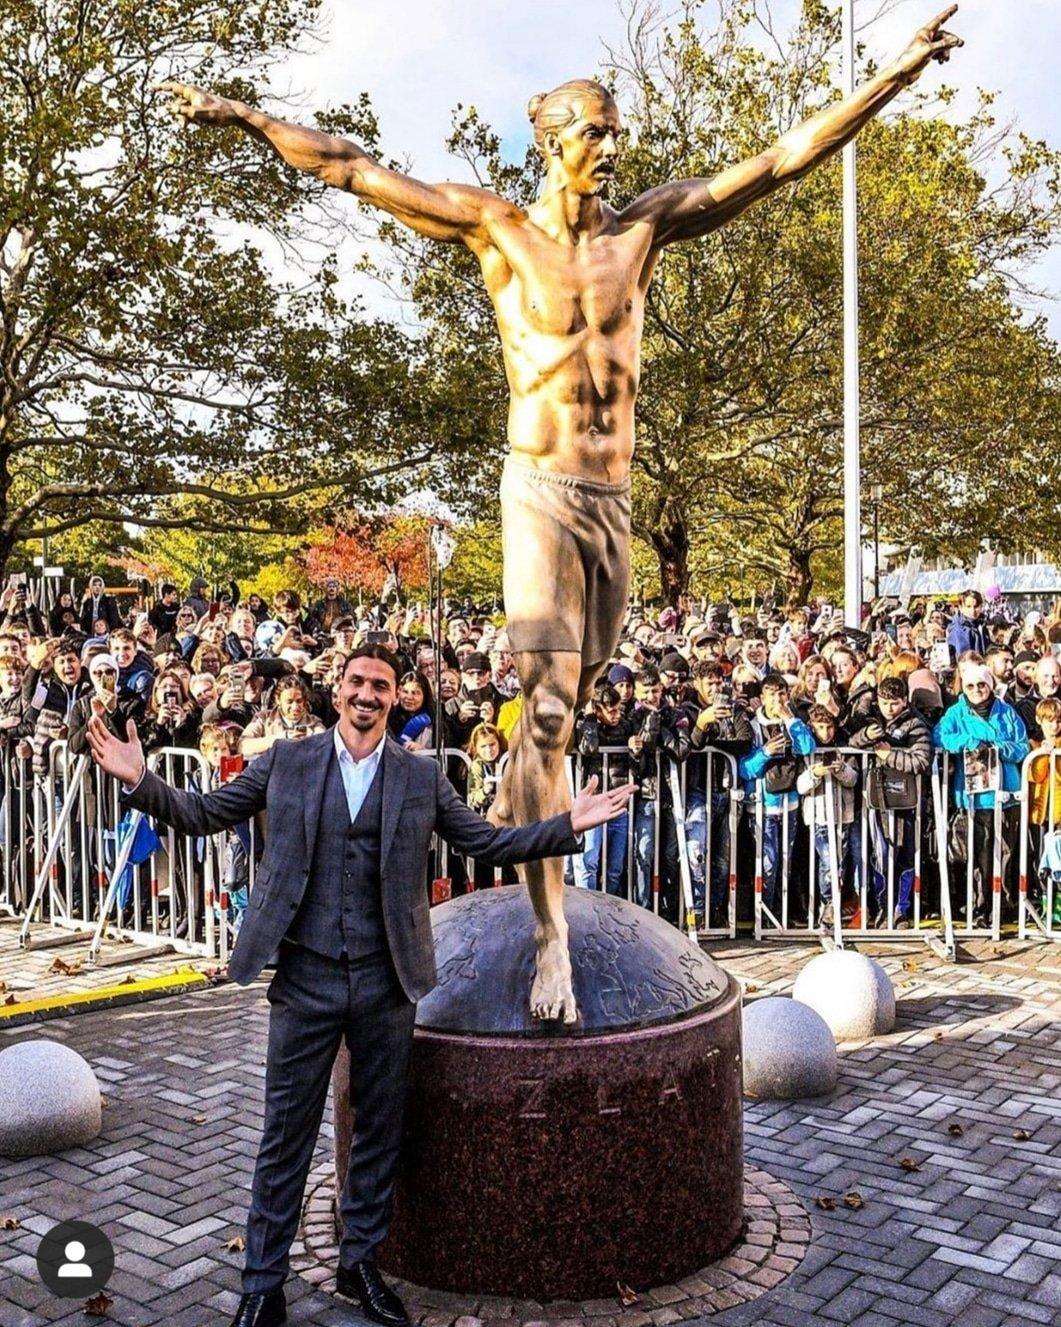 Swedish FA commissions 8.9 feet tall Zlatan's shirtless statue